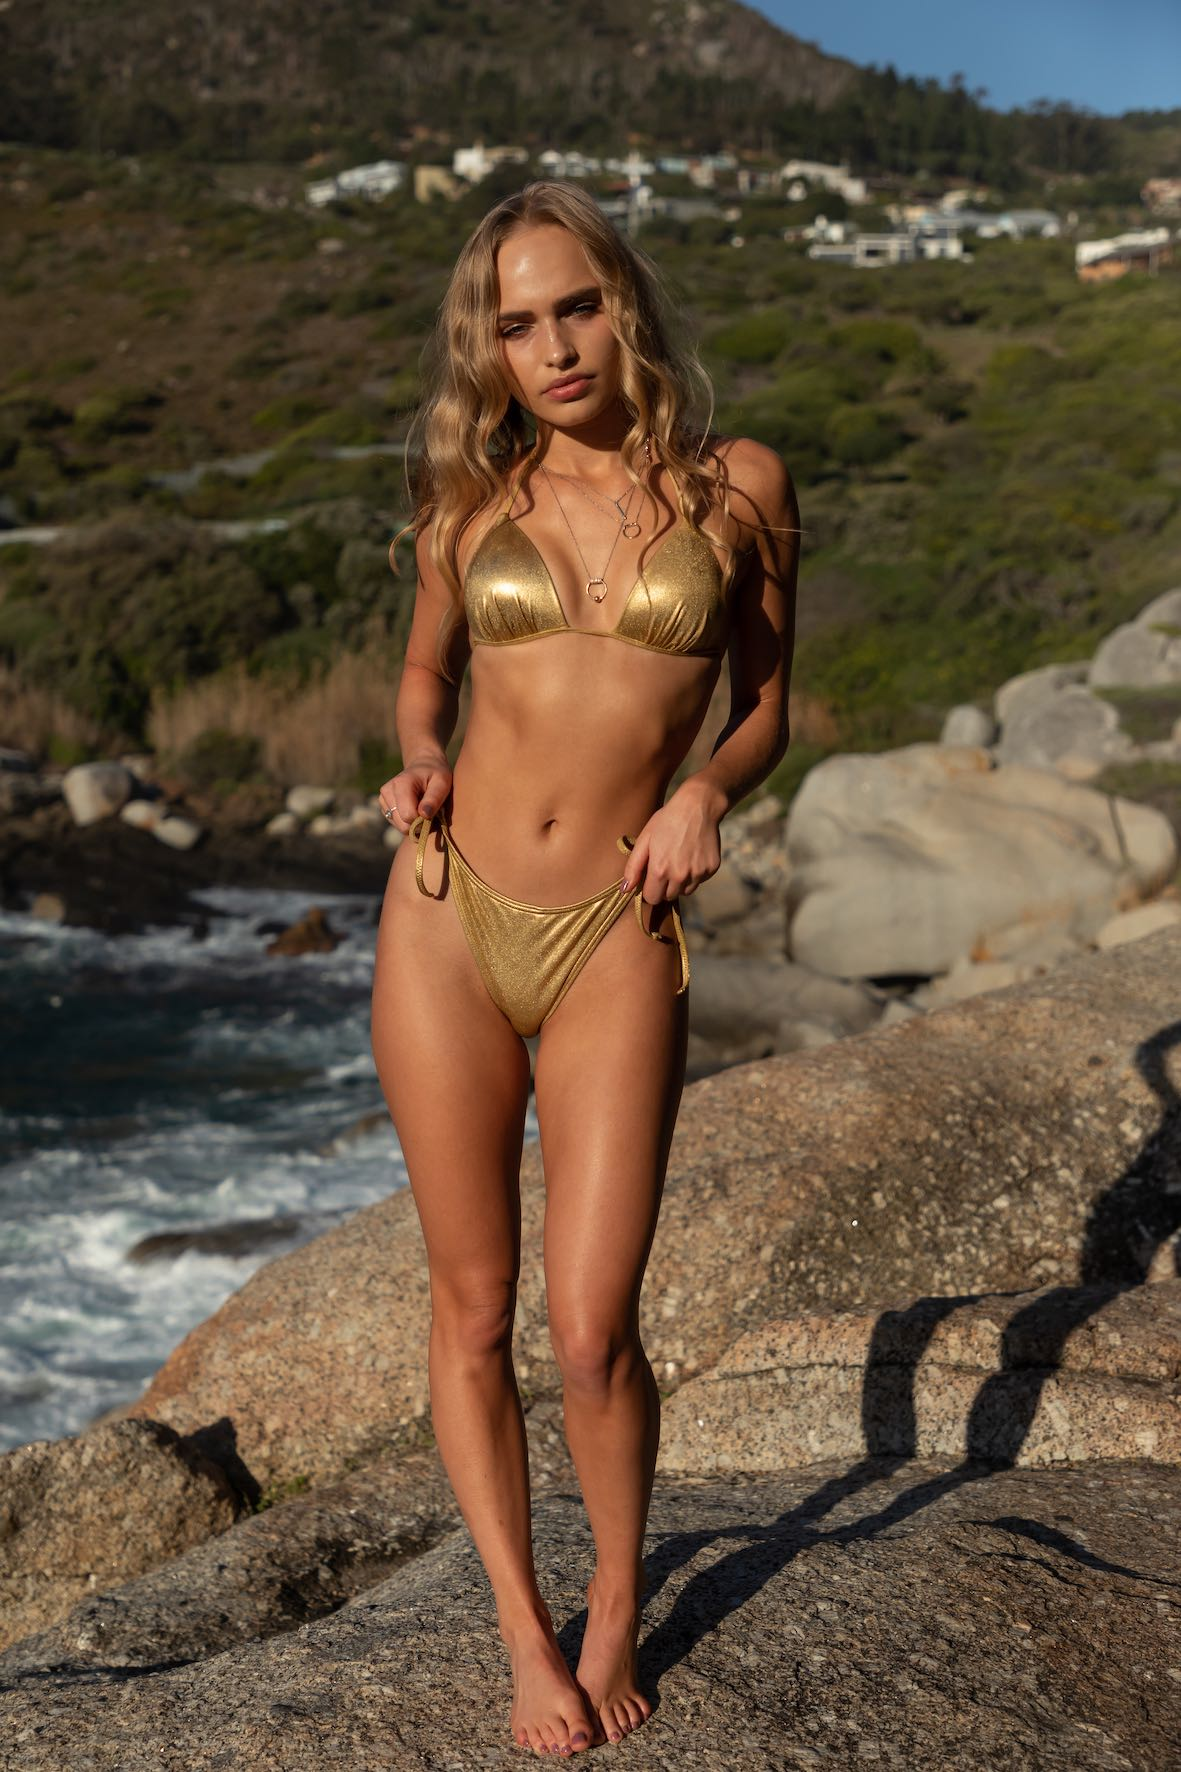 Meet Bianca Ludik in our SA Girls Feature